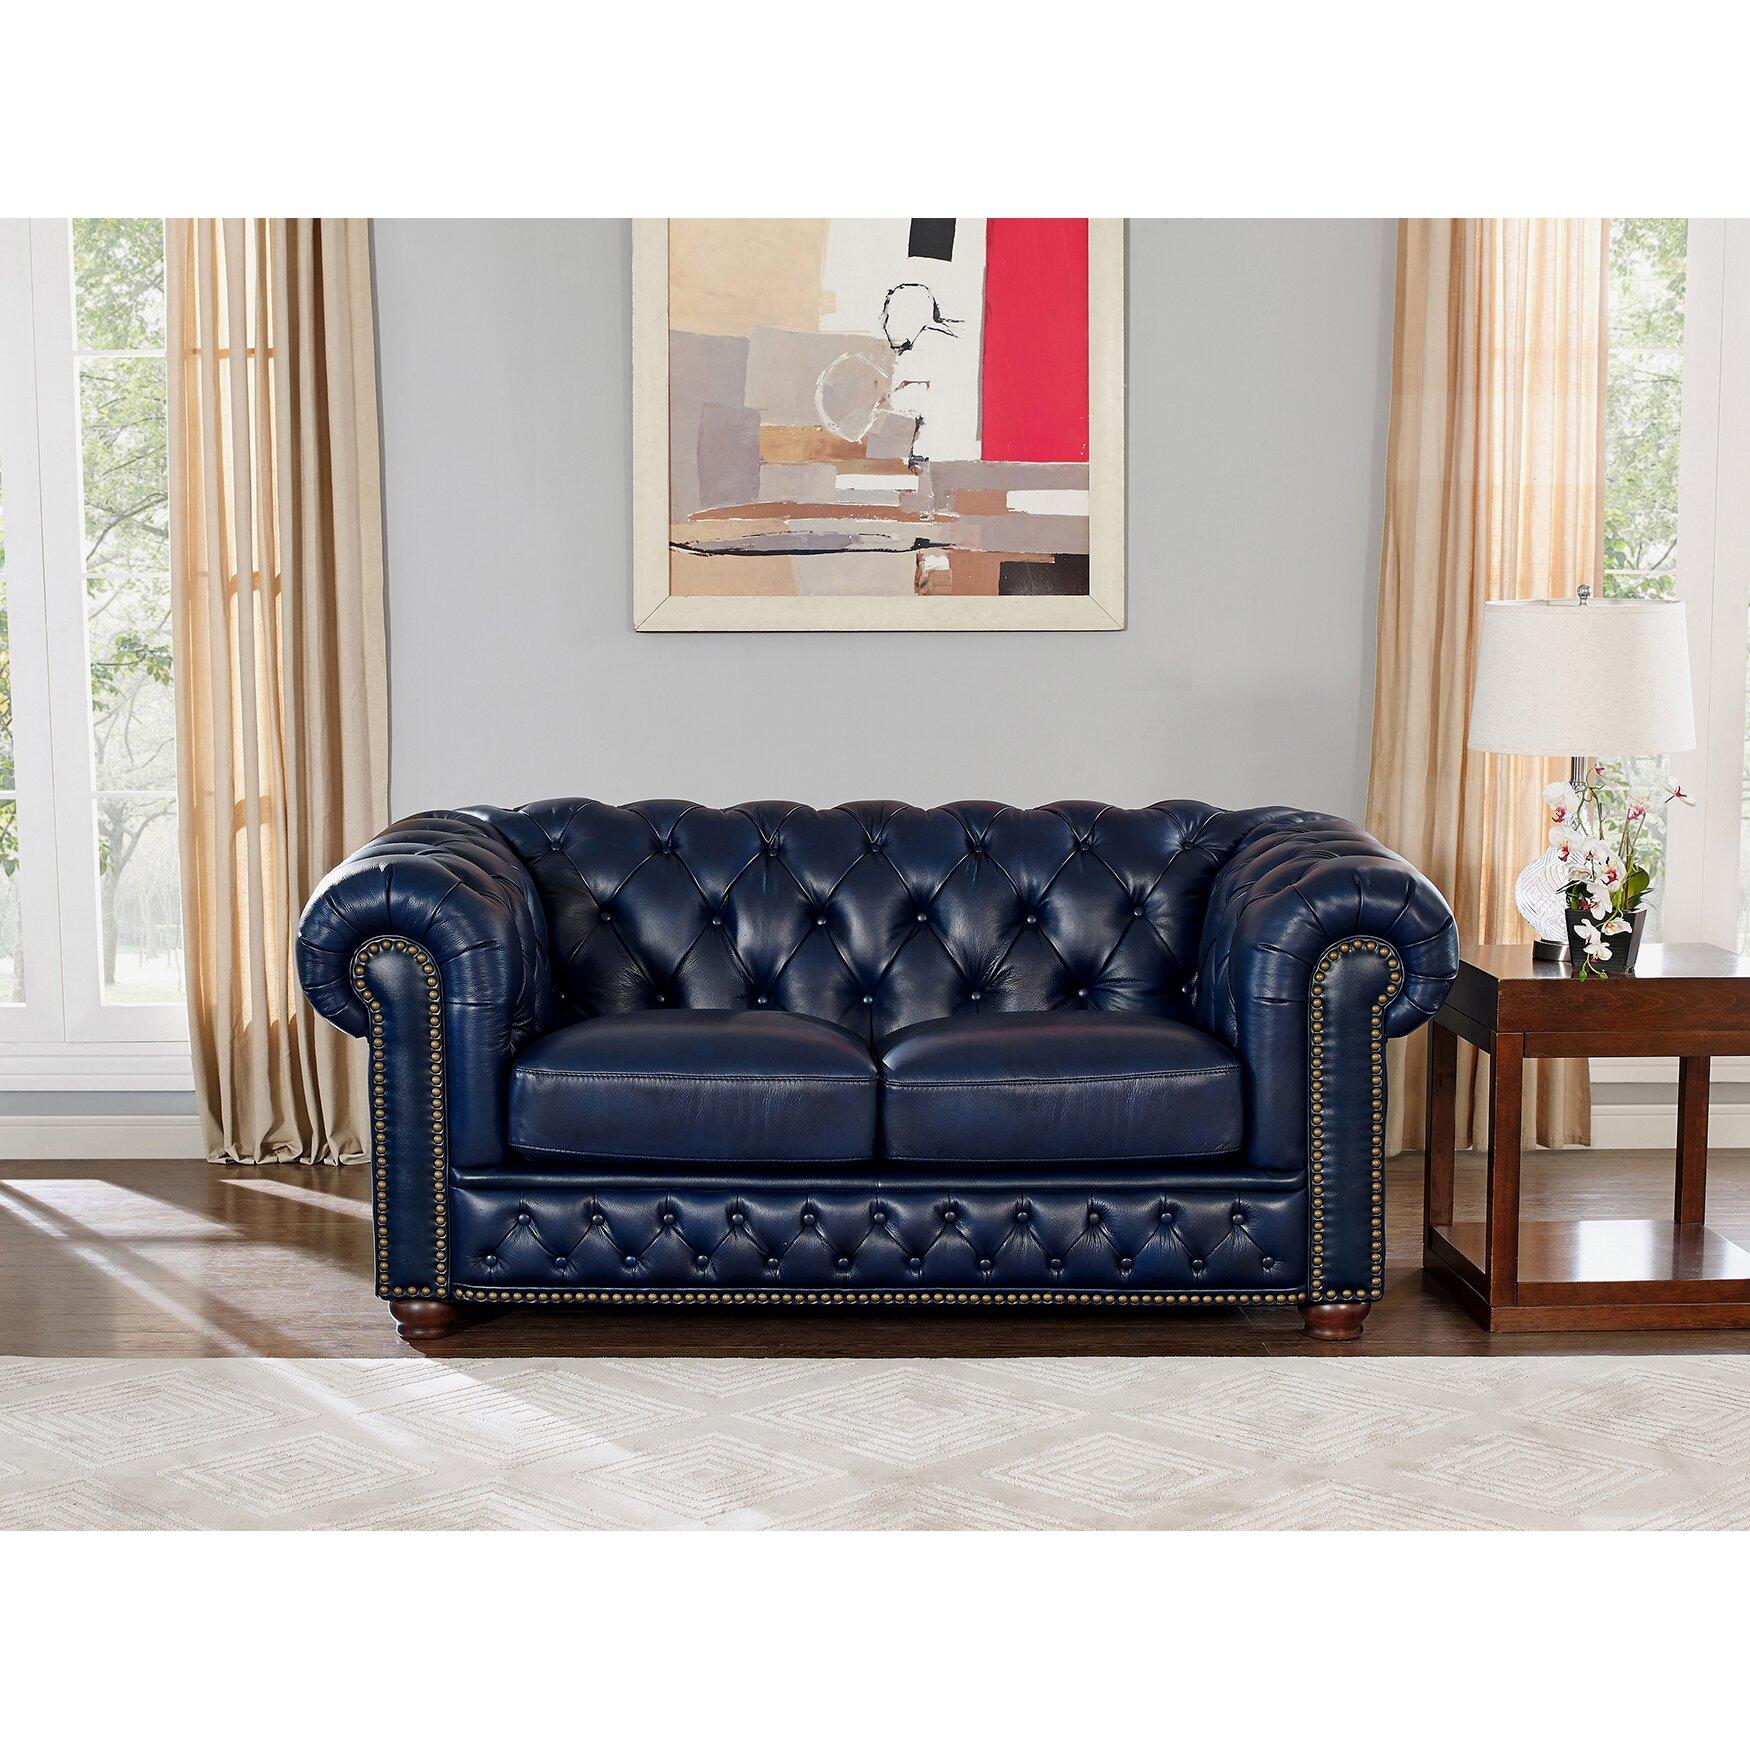 Corbett leather sofa and loveseat set